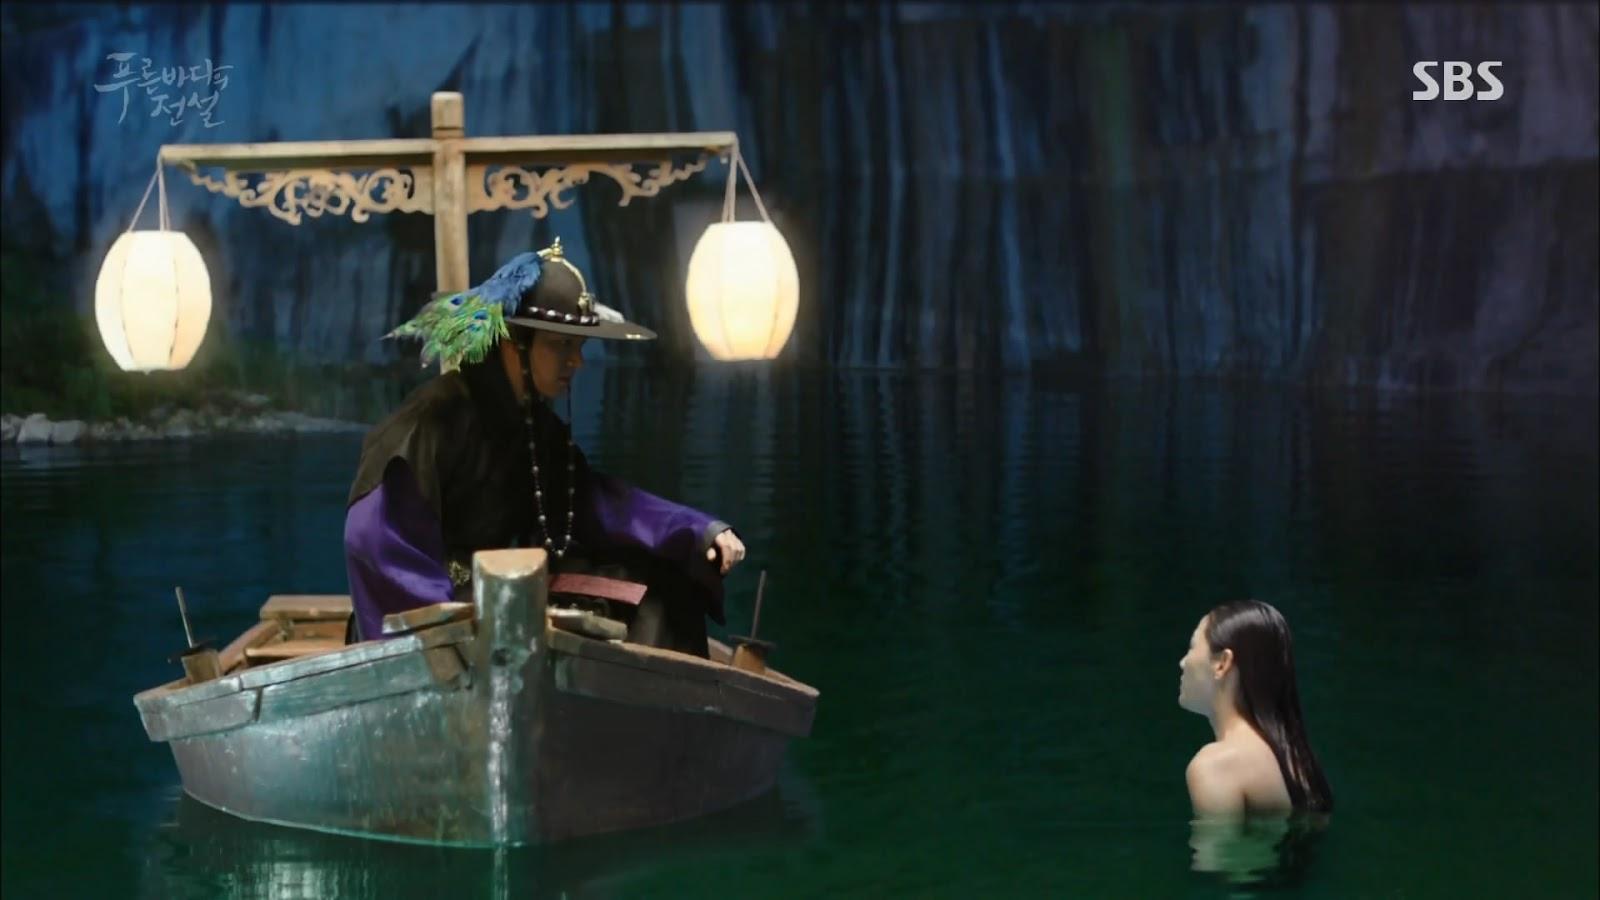 Screenshot Joon Jea And Cheong Yi Beginning Scene The Legend Of The Blu Sea (2016)  1080p Episode 03 - www.uchiha-uzuma.com